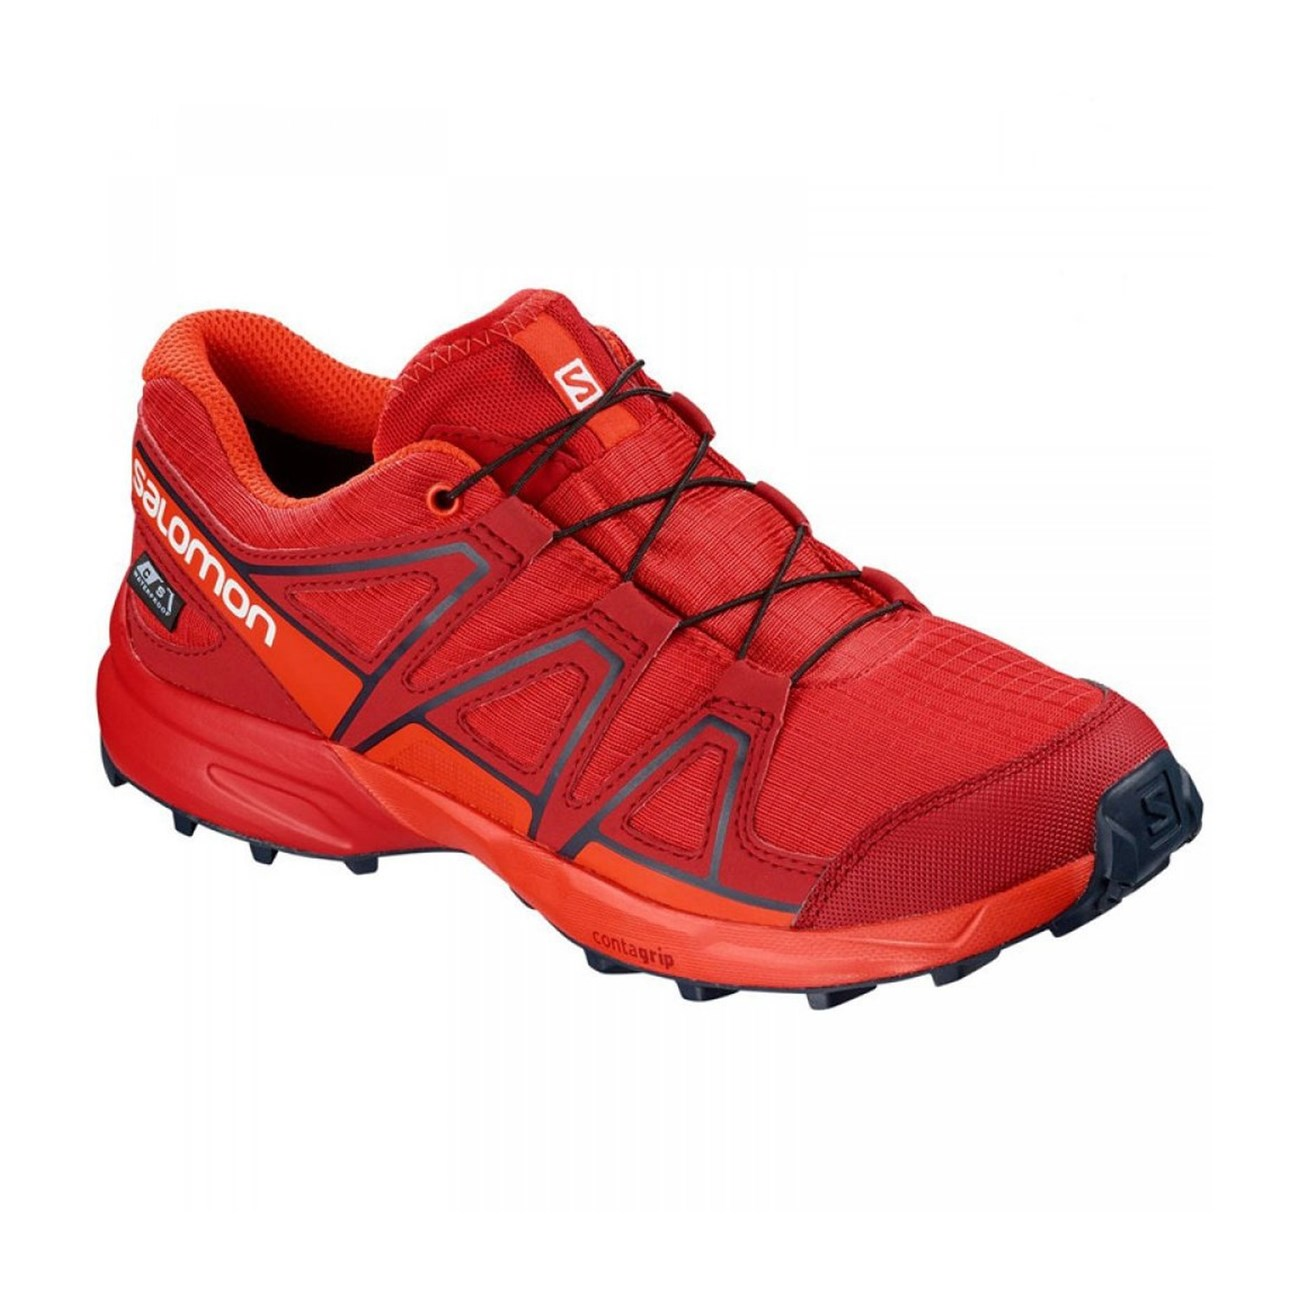 b35841a4181 SALOMON SPEEDCROSS JR < Παπούτσια Ορειβασίας | INTERSPORT